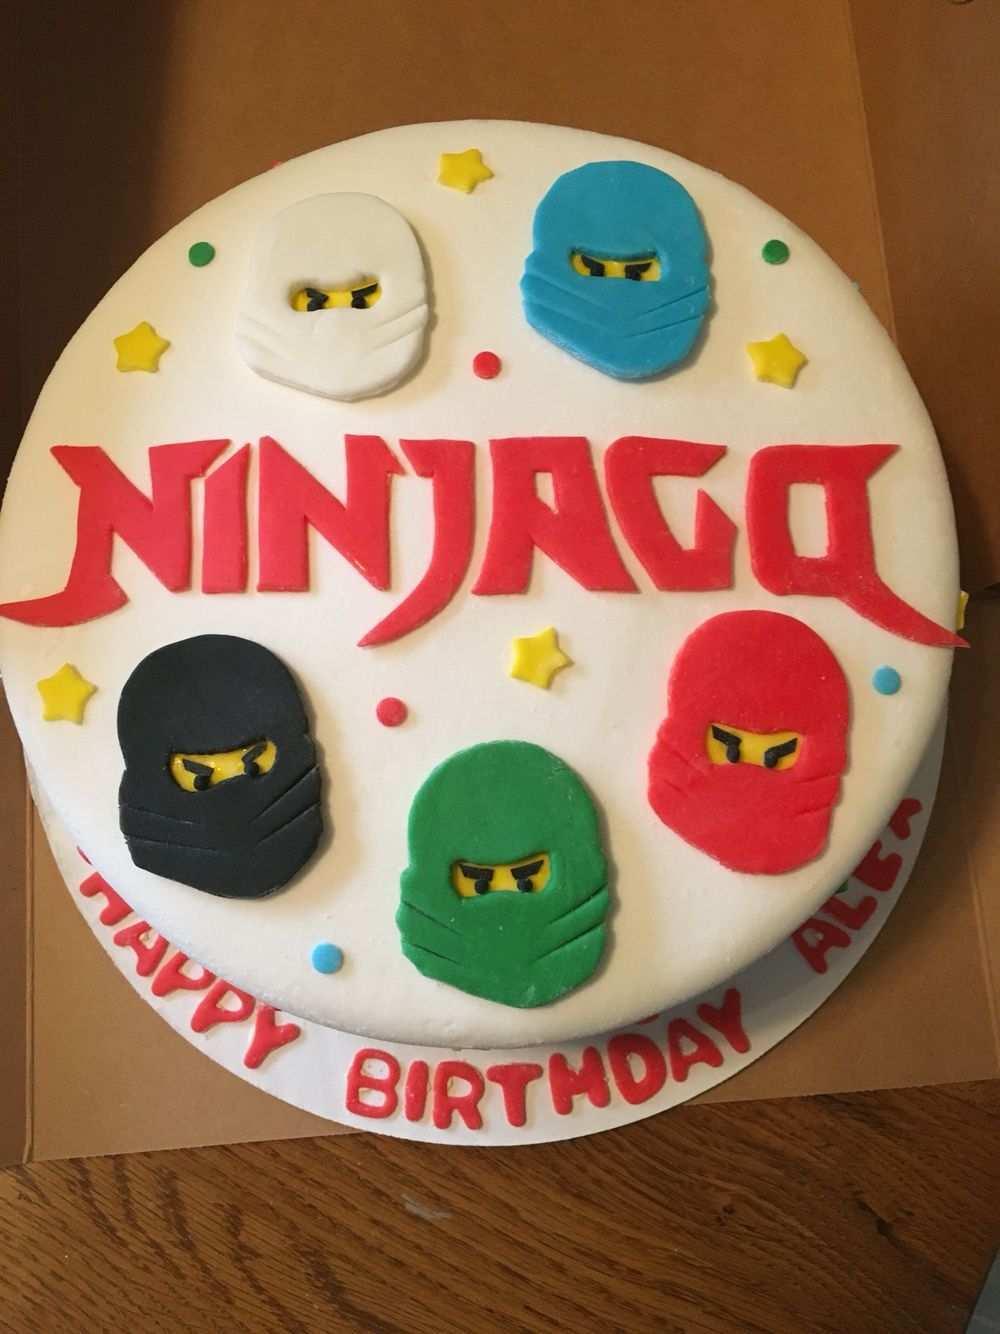 Ninjago Birthday Cake Kuchen Geburtstag Geburtstagstorte Torte Kindergeburtstag Junge